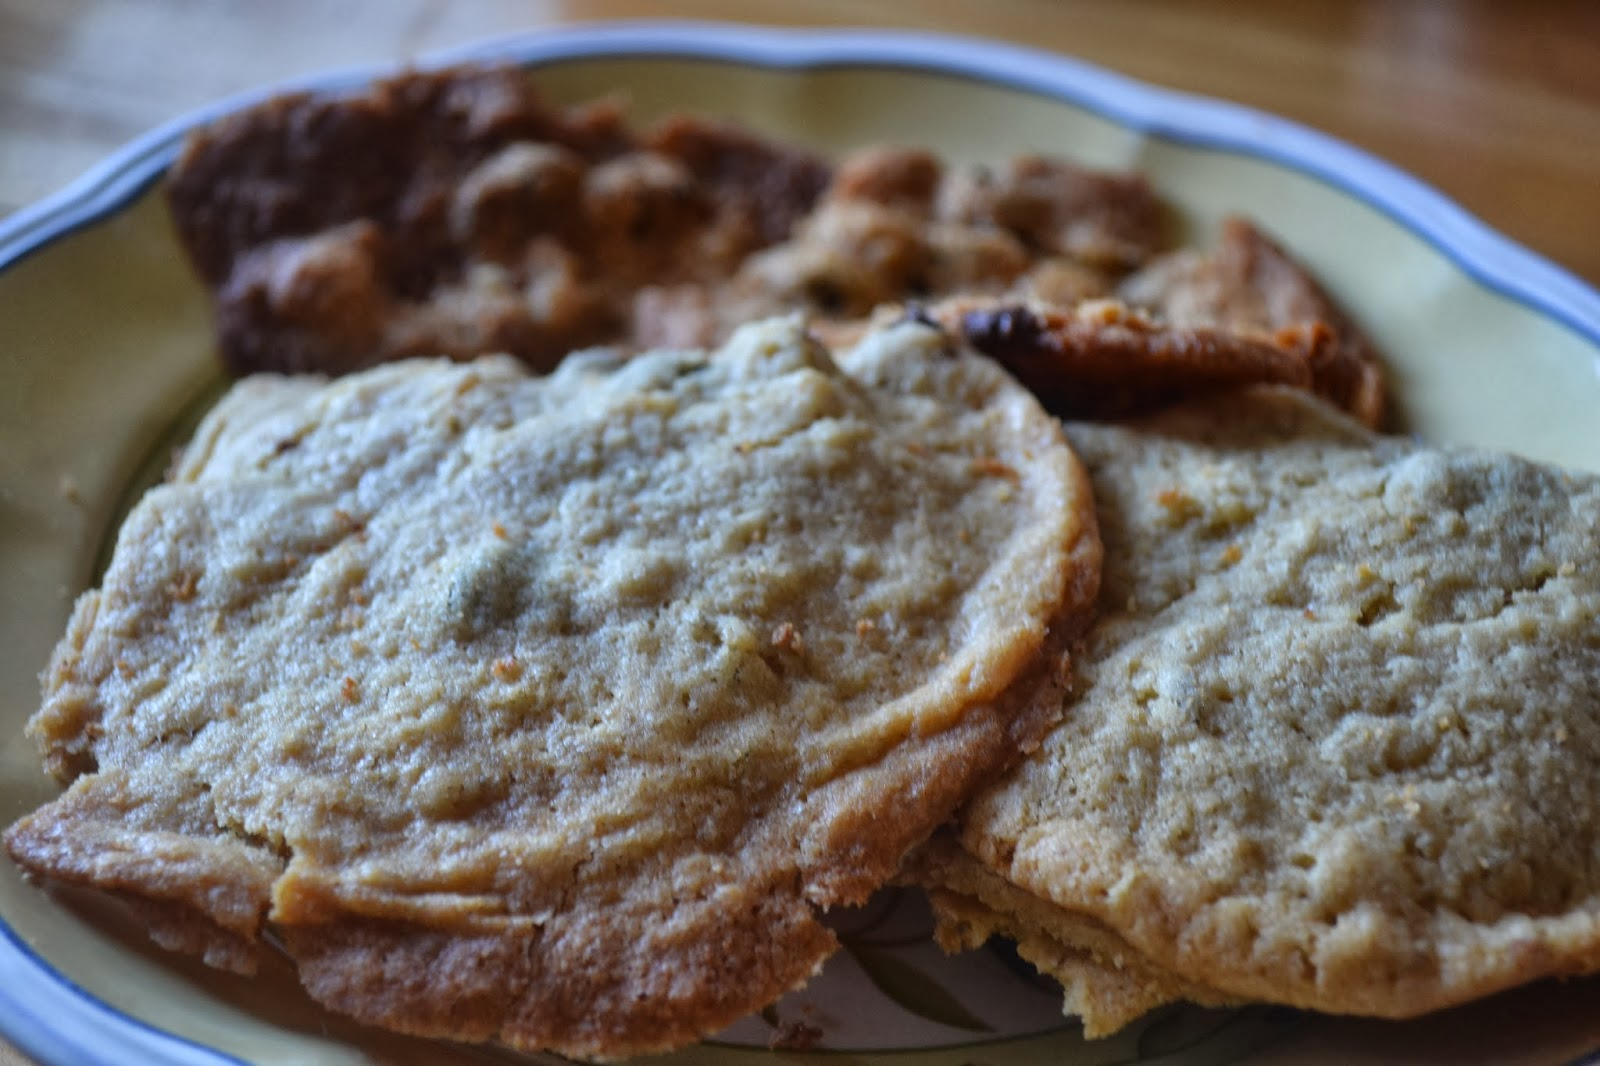 ... Miracles: Secret Recipe Club: Neiman Marcus Chocolate Chip Cookies